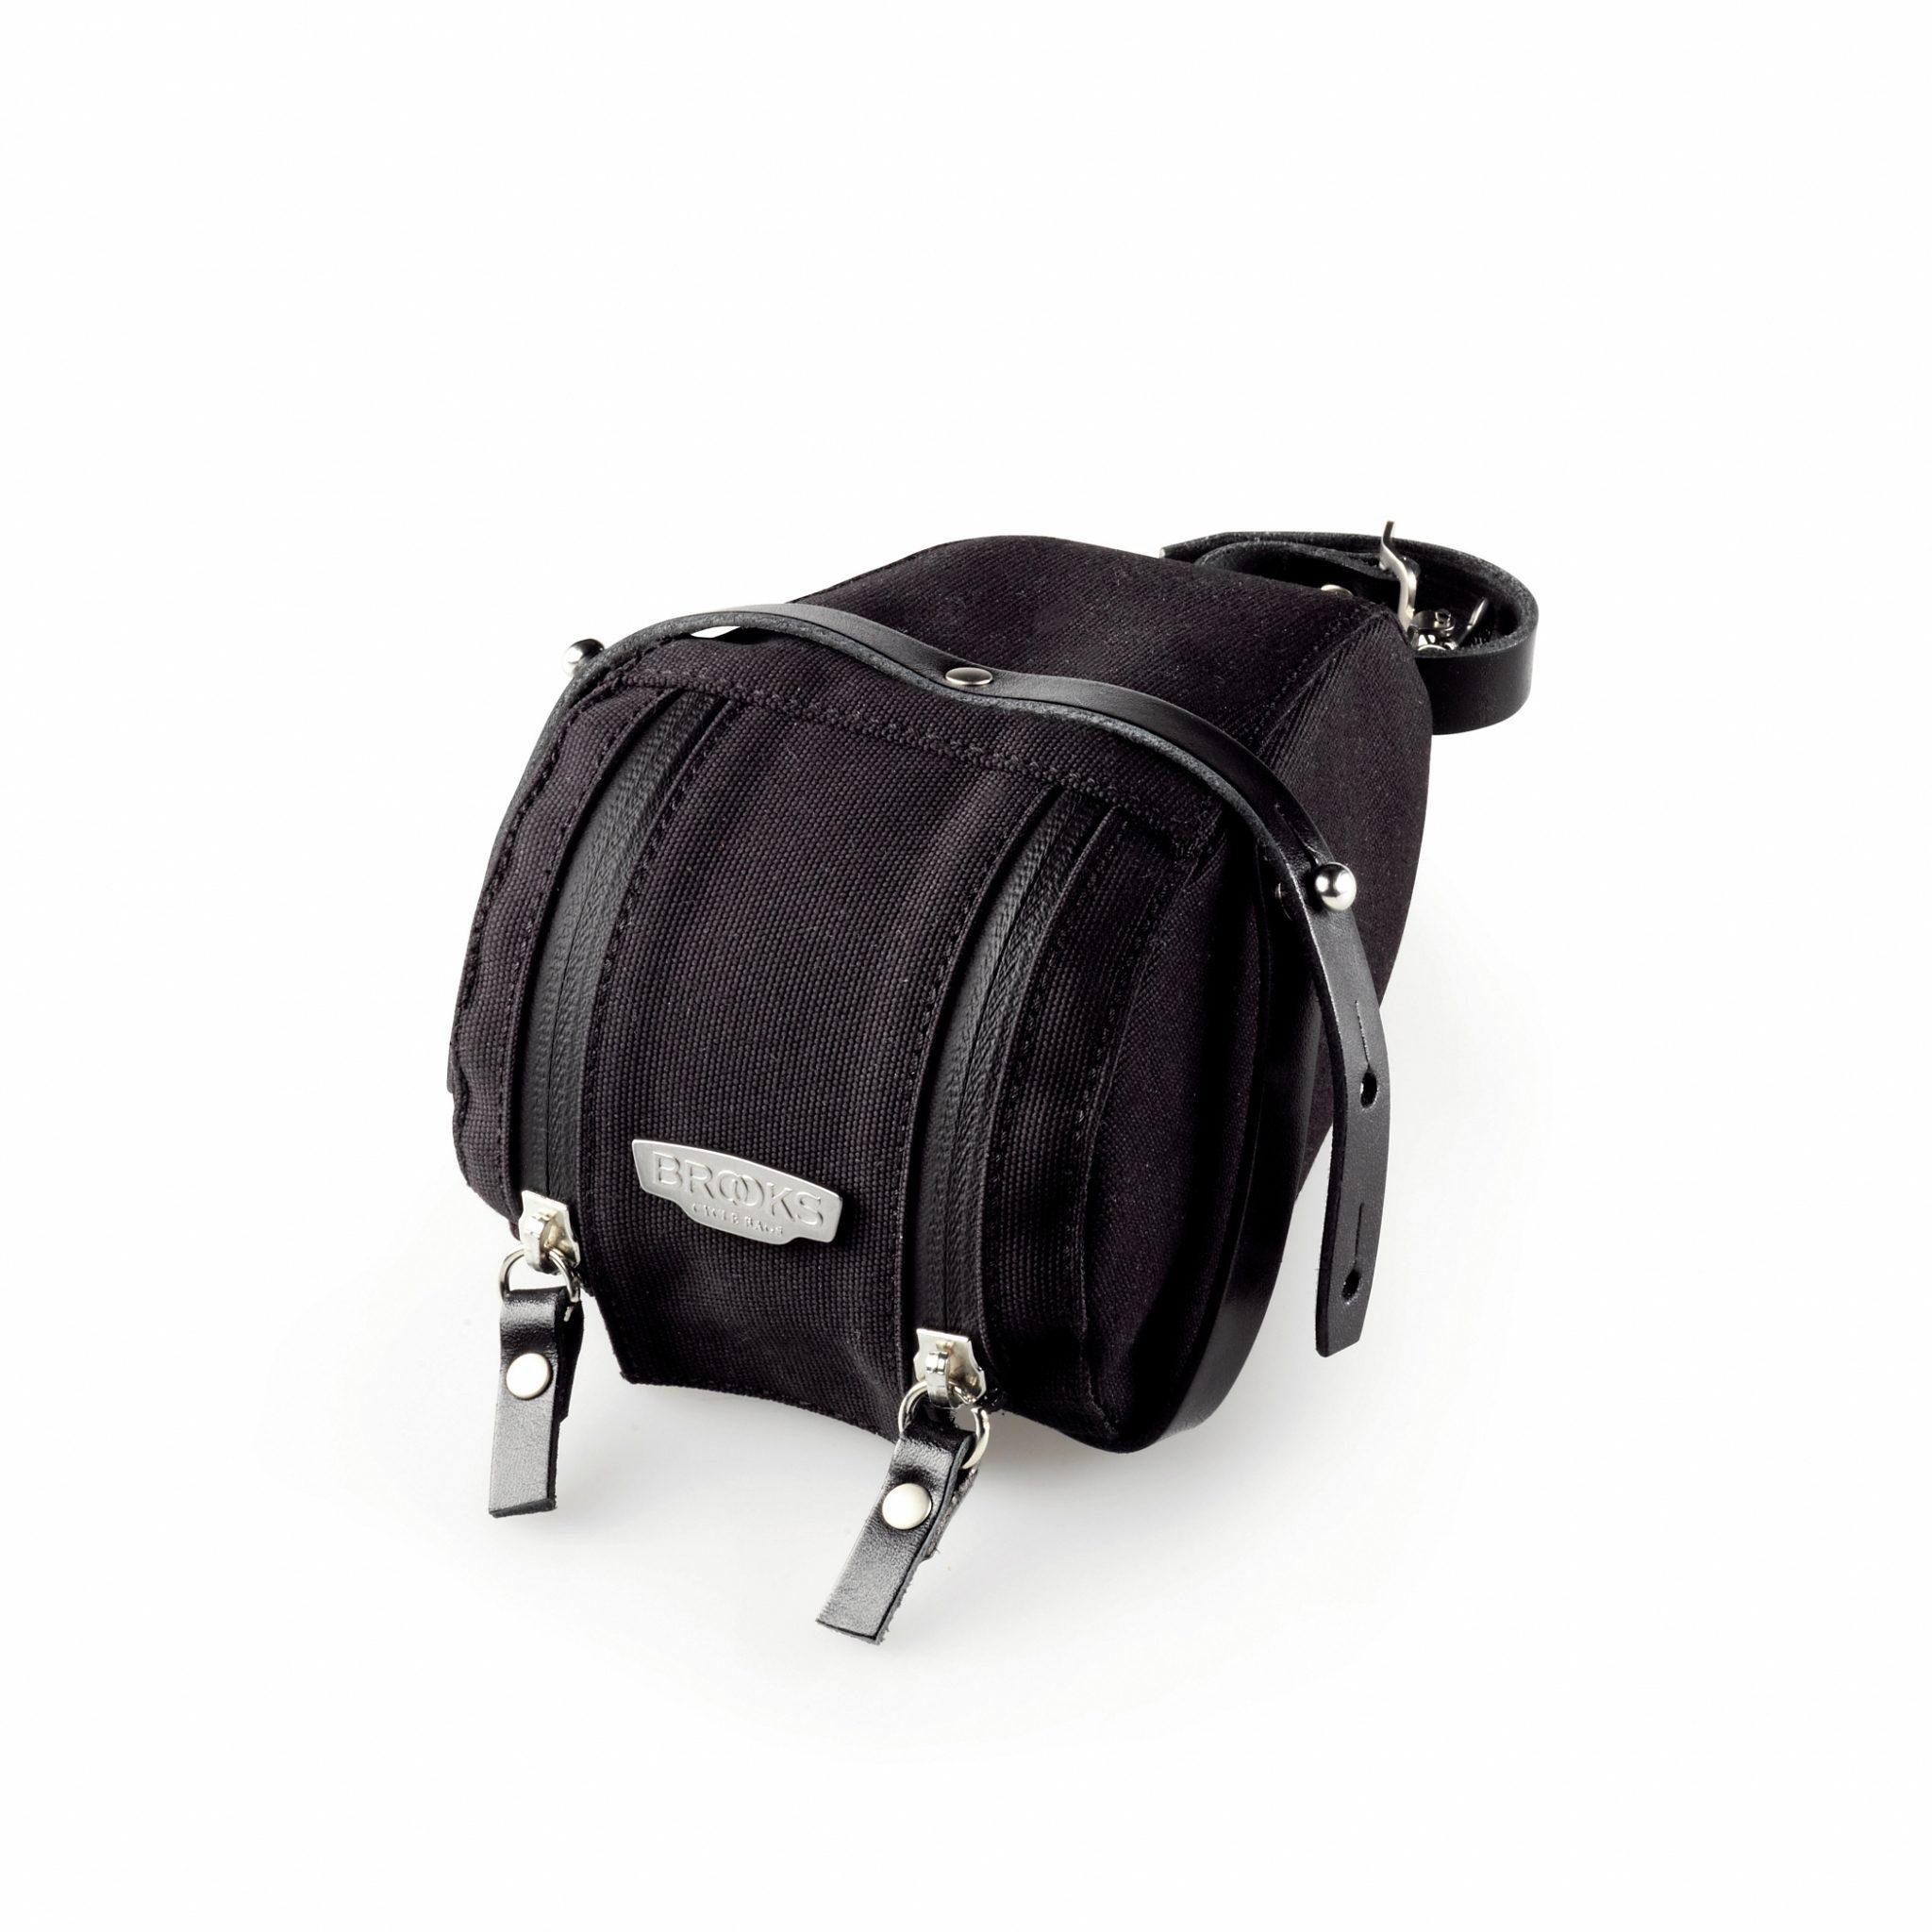 Brooks Gepäckträgertasche »Isle of Wight Saddle Bag Small«